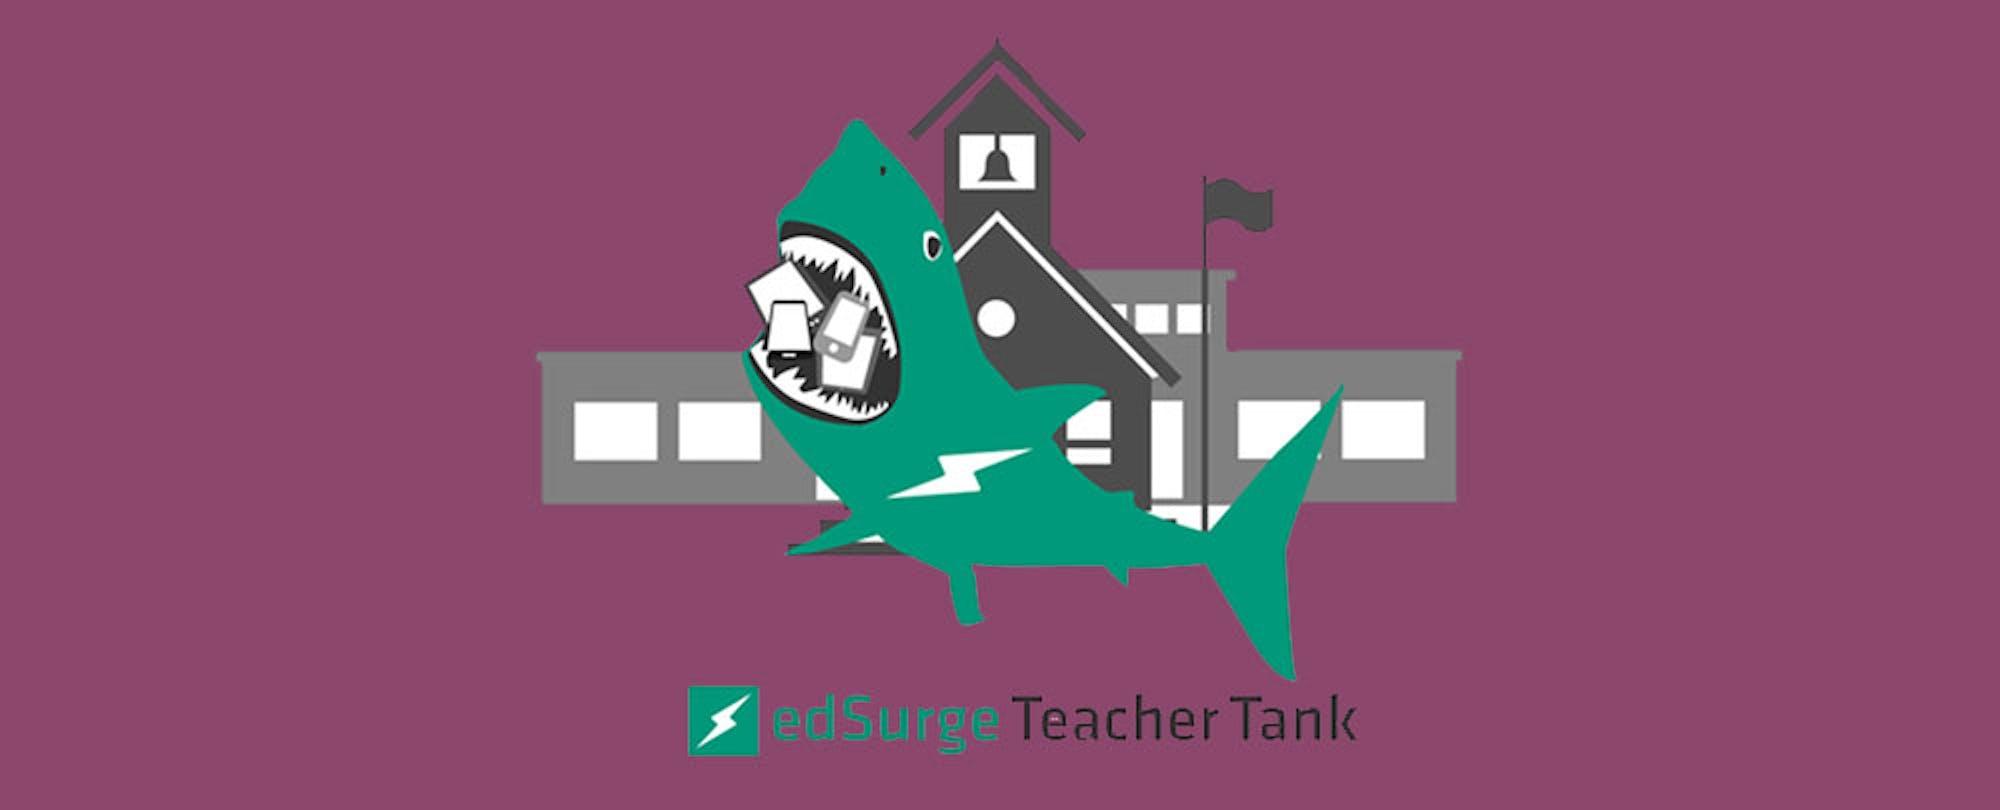 How to Survive the EdSurge Teacher Tank